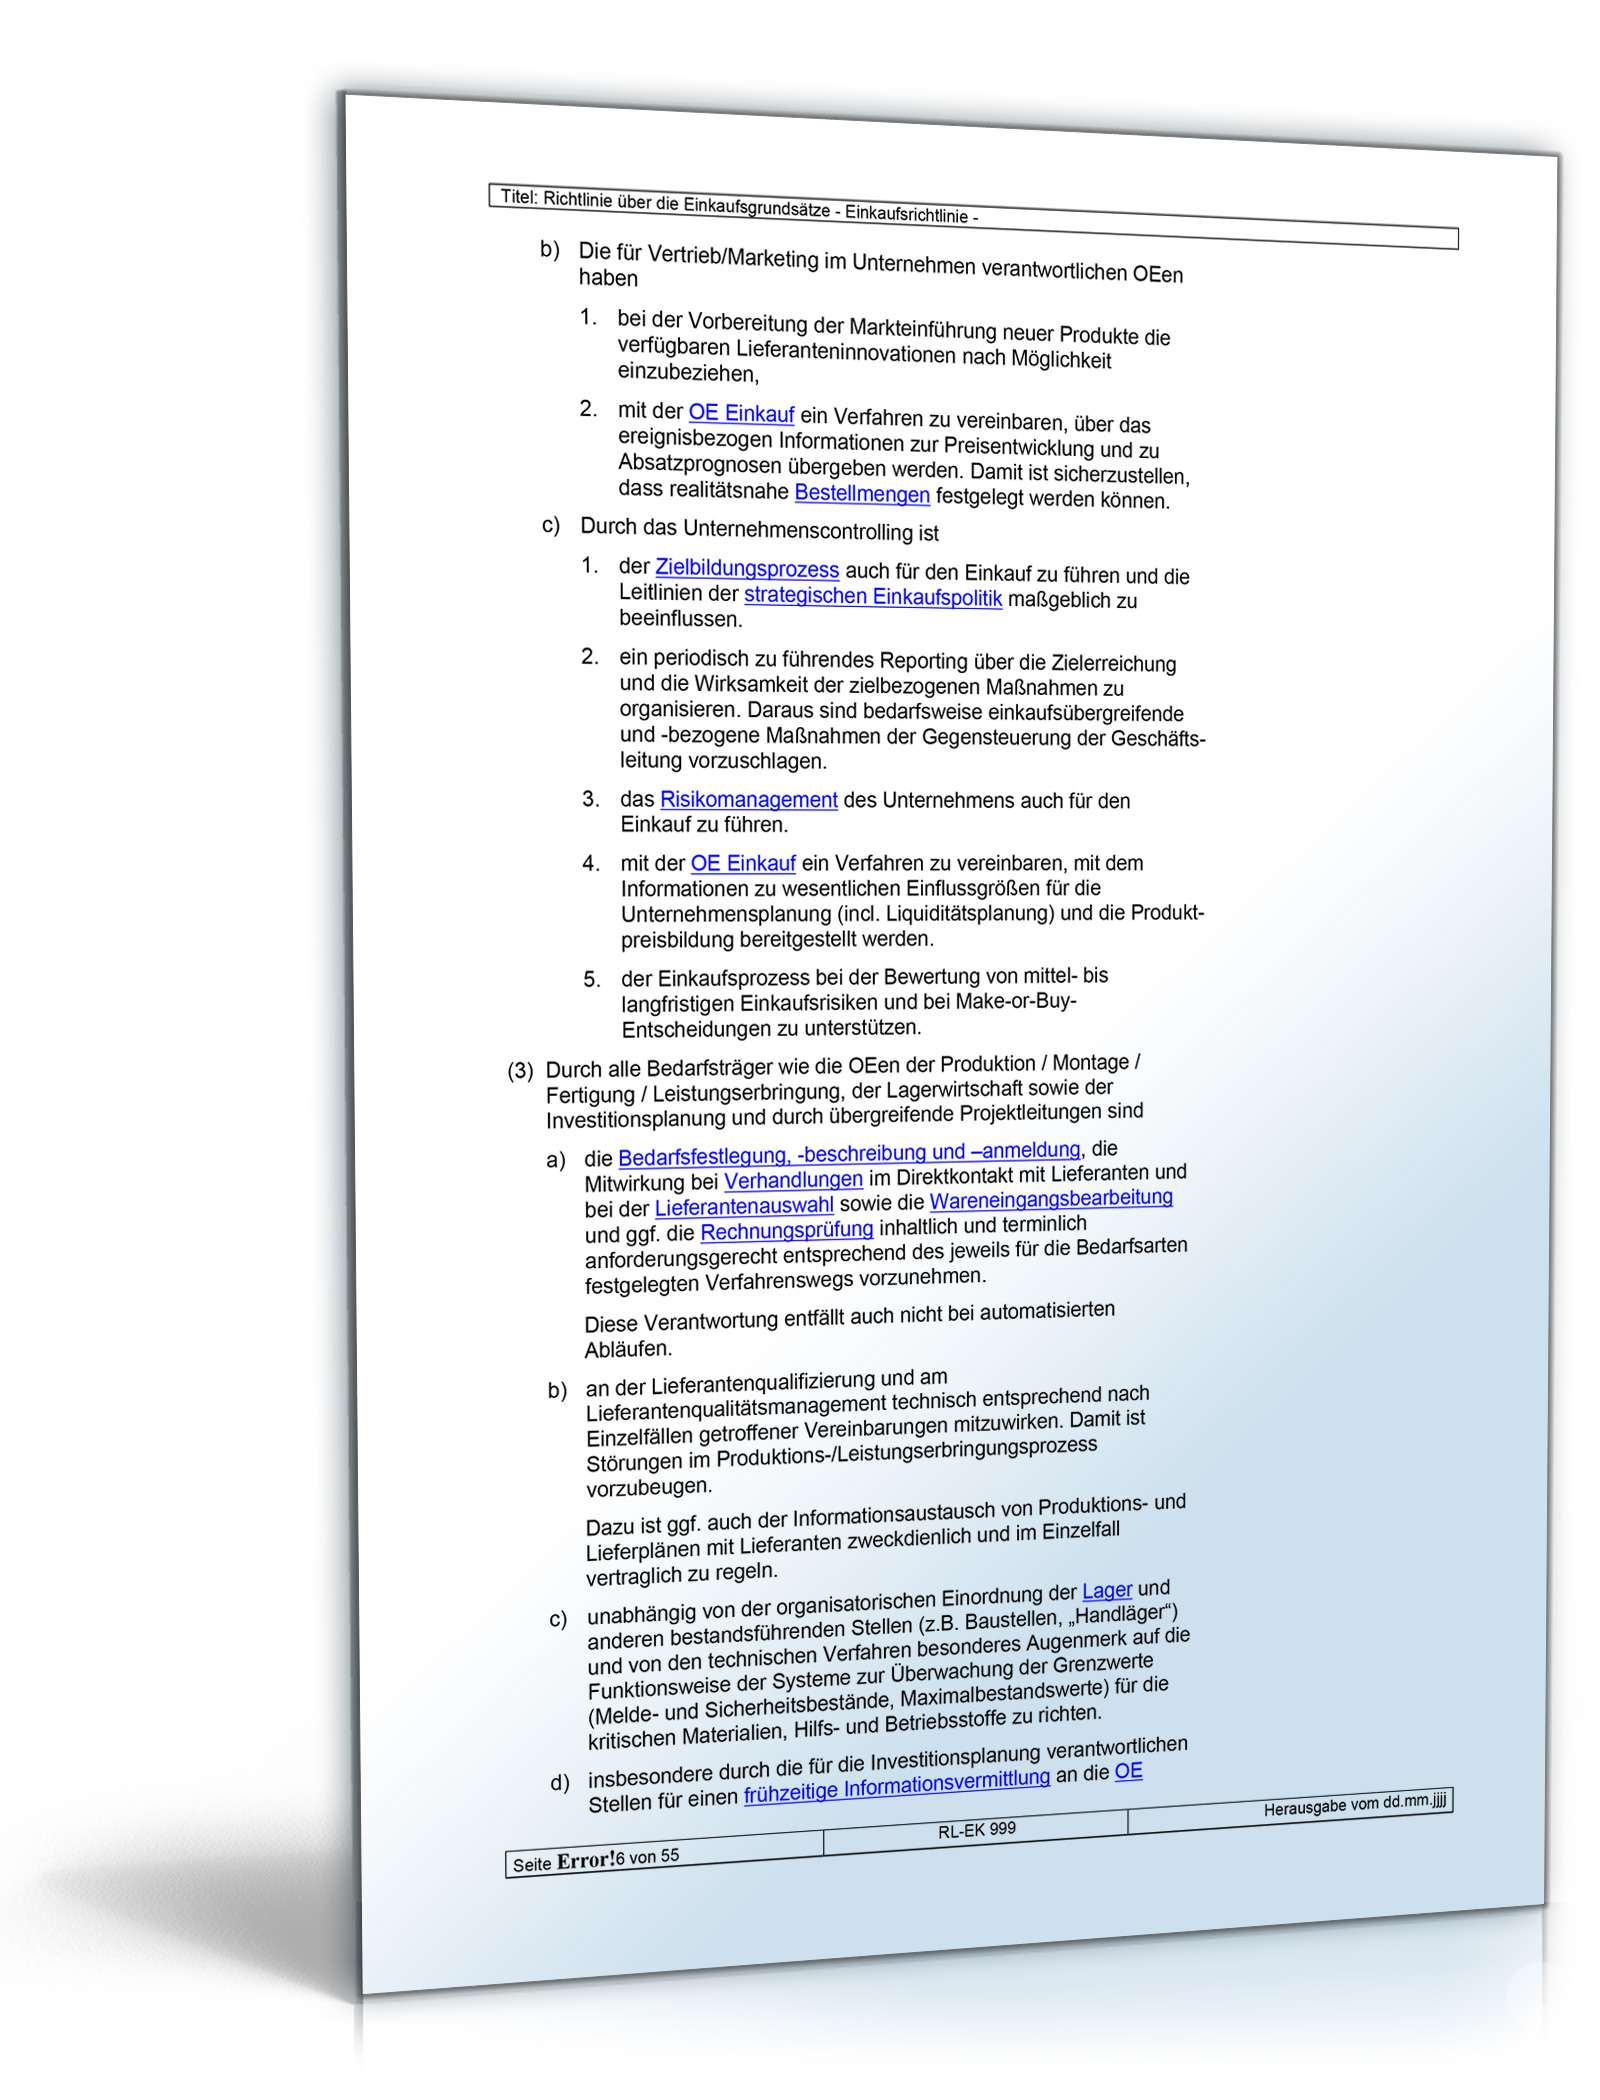 Tolle Ncnd Vorlage Galerie - Entry Level Resume Vorlagen Sammlung ...